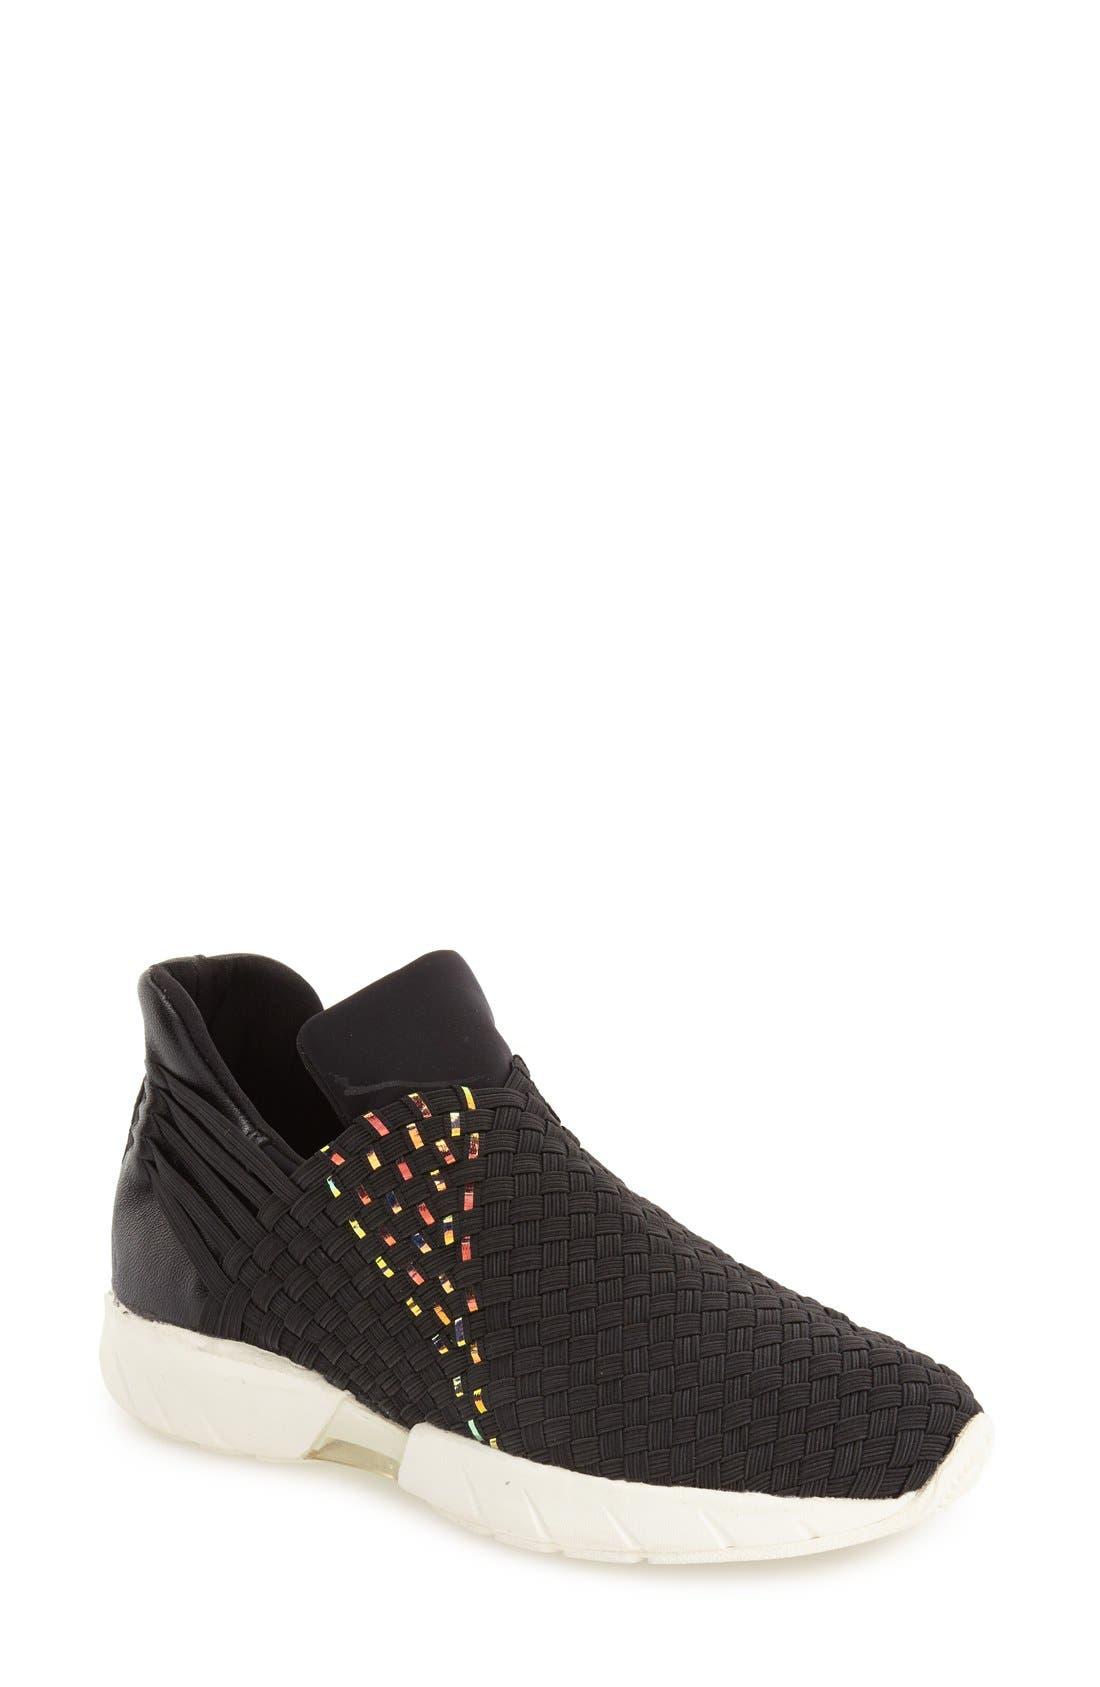 BERNIE MEV. 'Razer' Woven Slip-On Sneaker